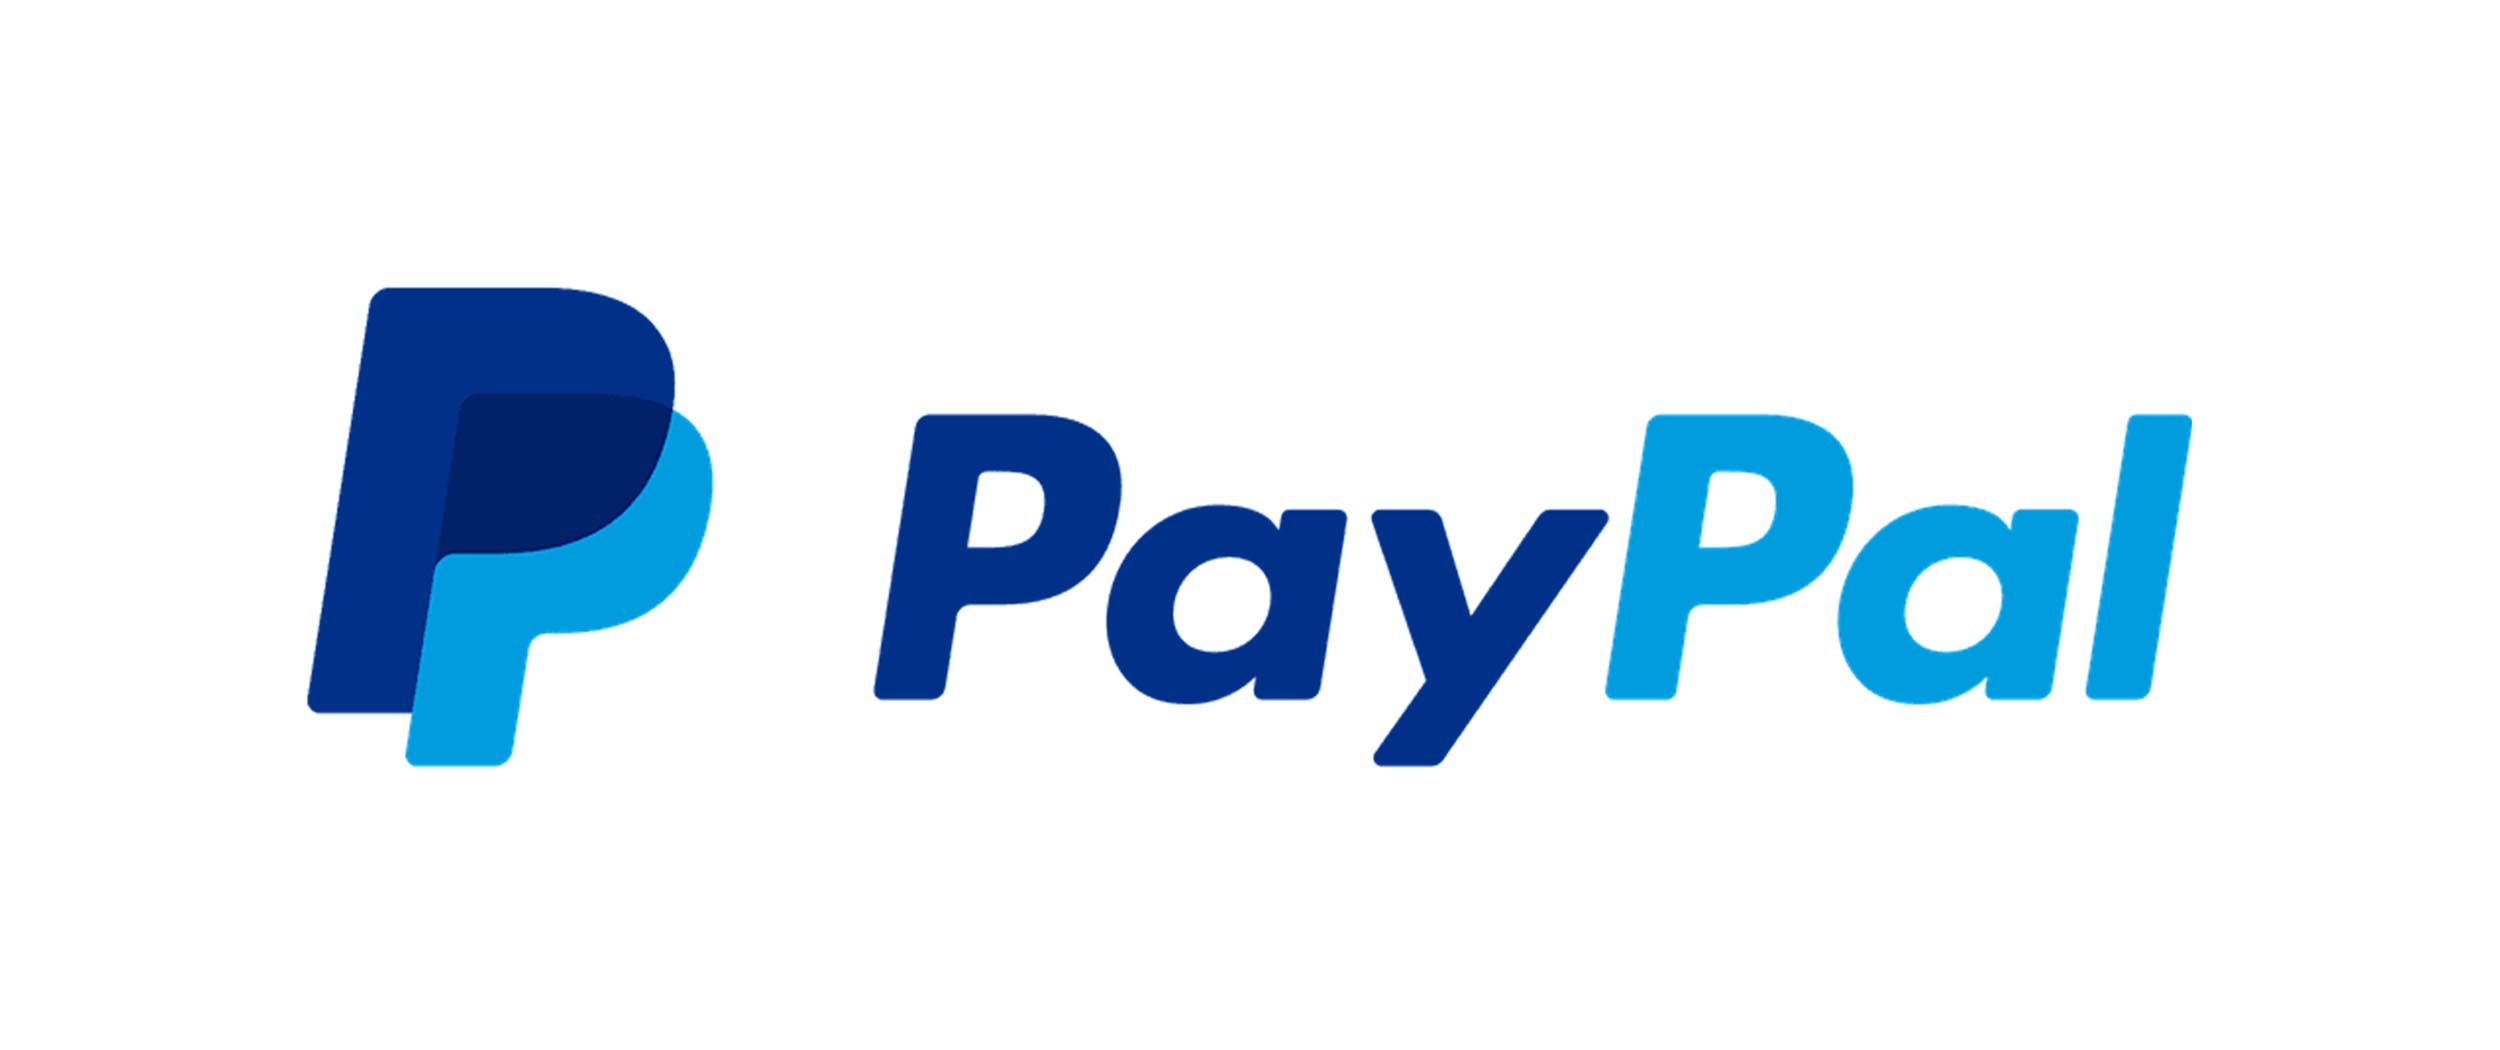 7 PayPal.jpg